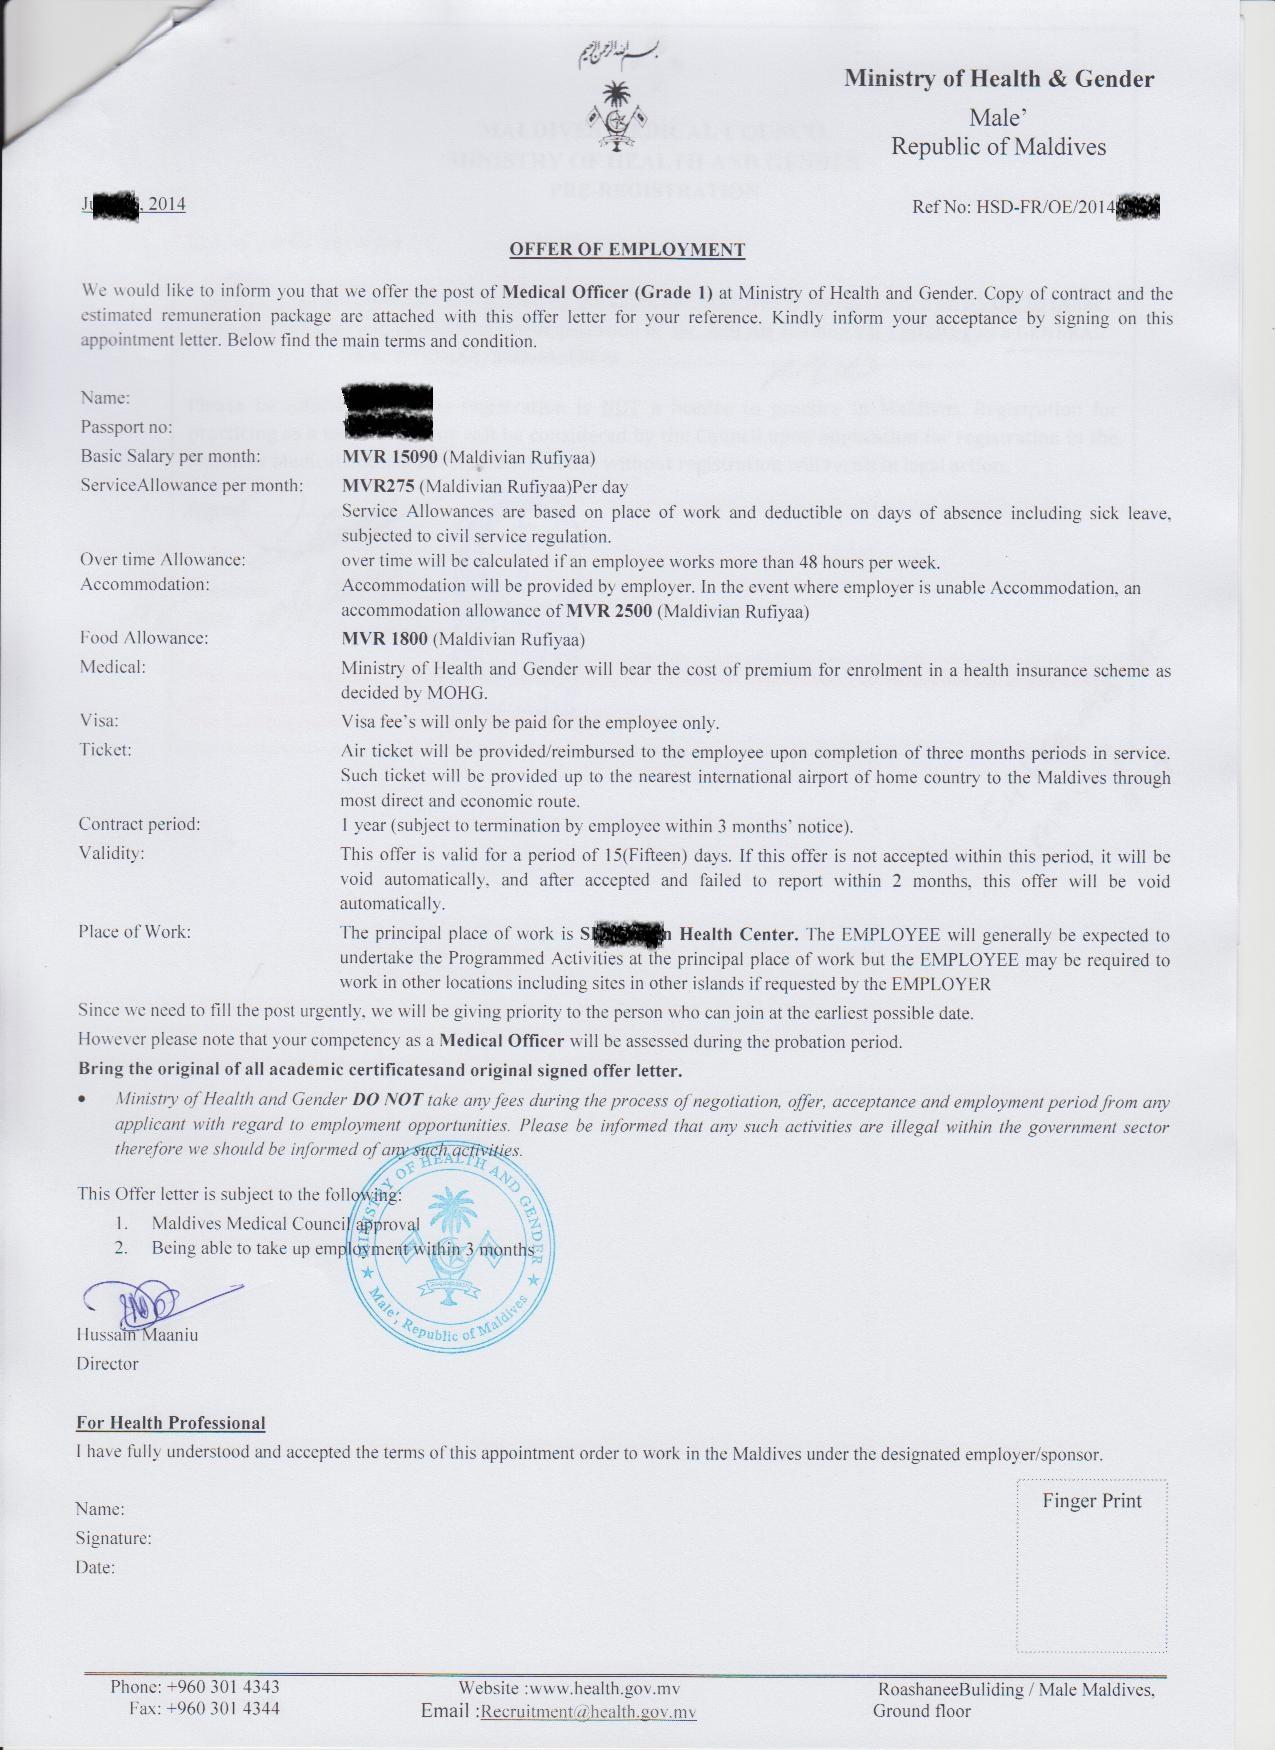 Pak Doctors In Maldives | chaudharyasif129